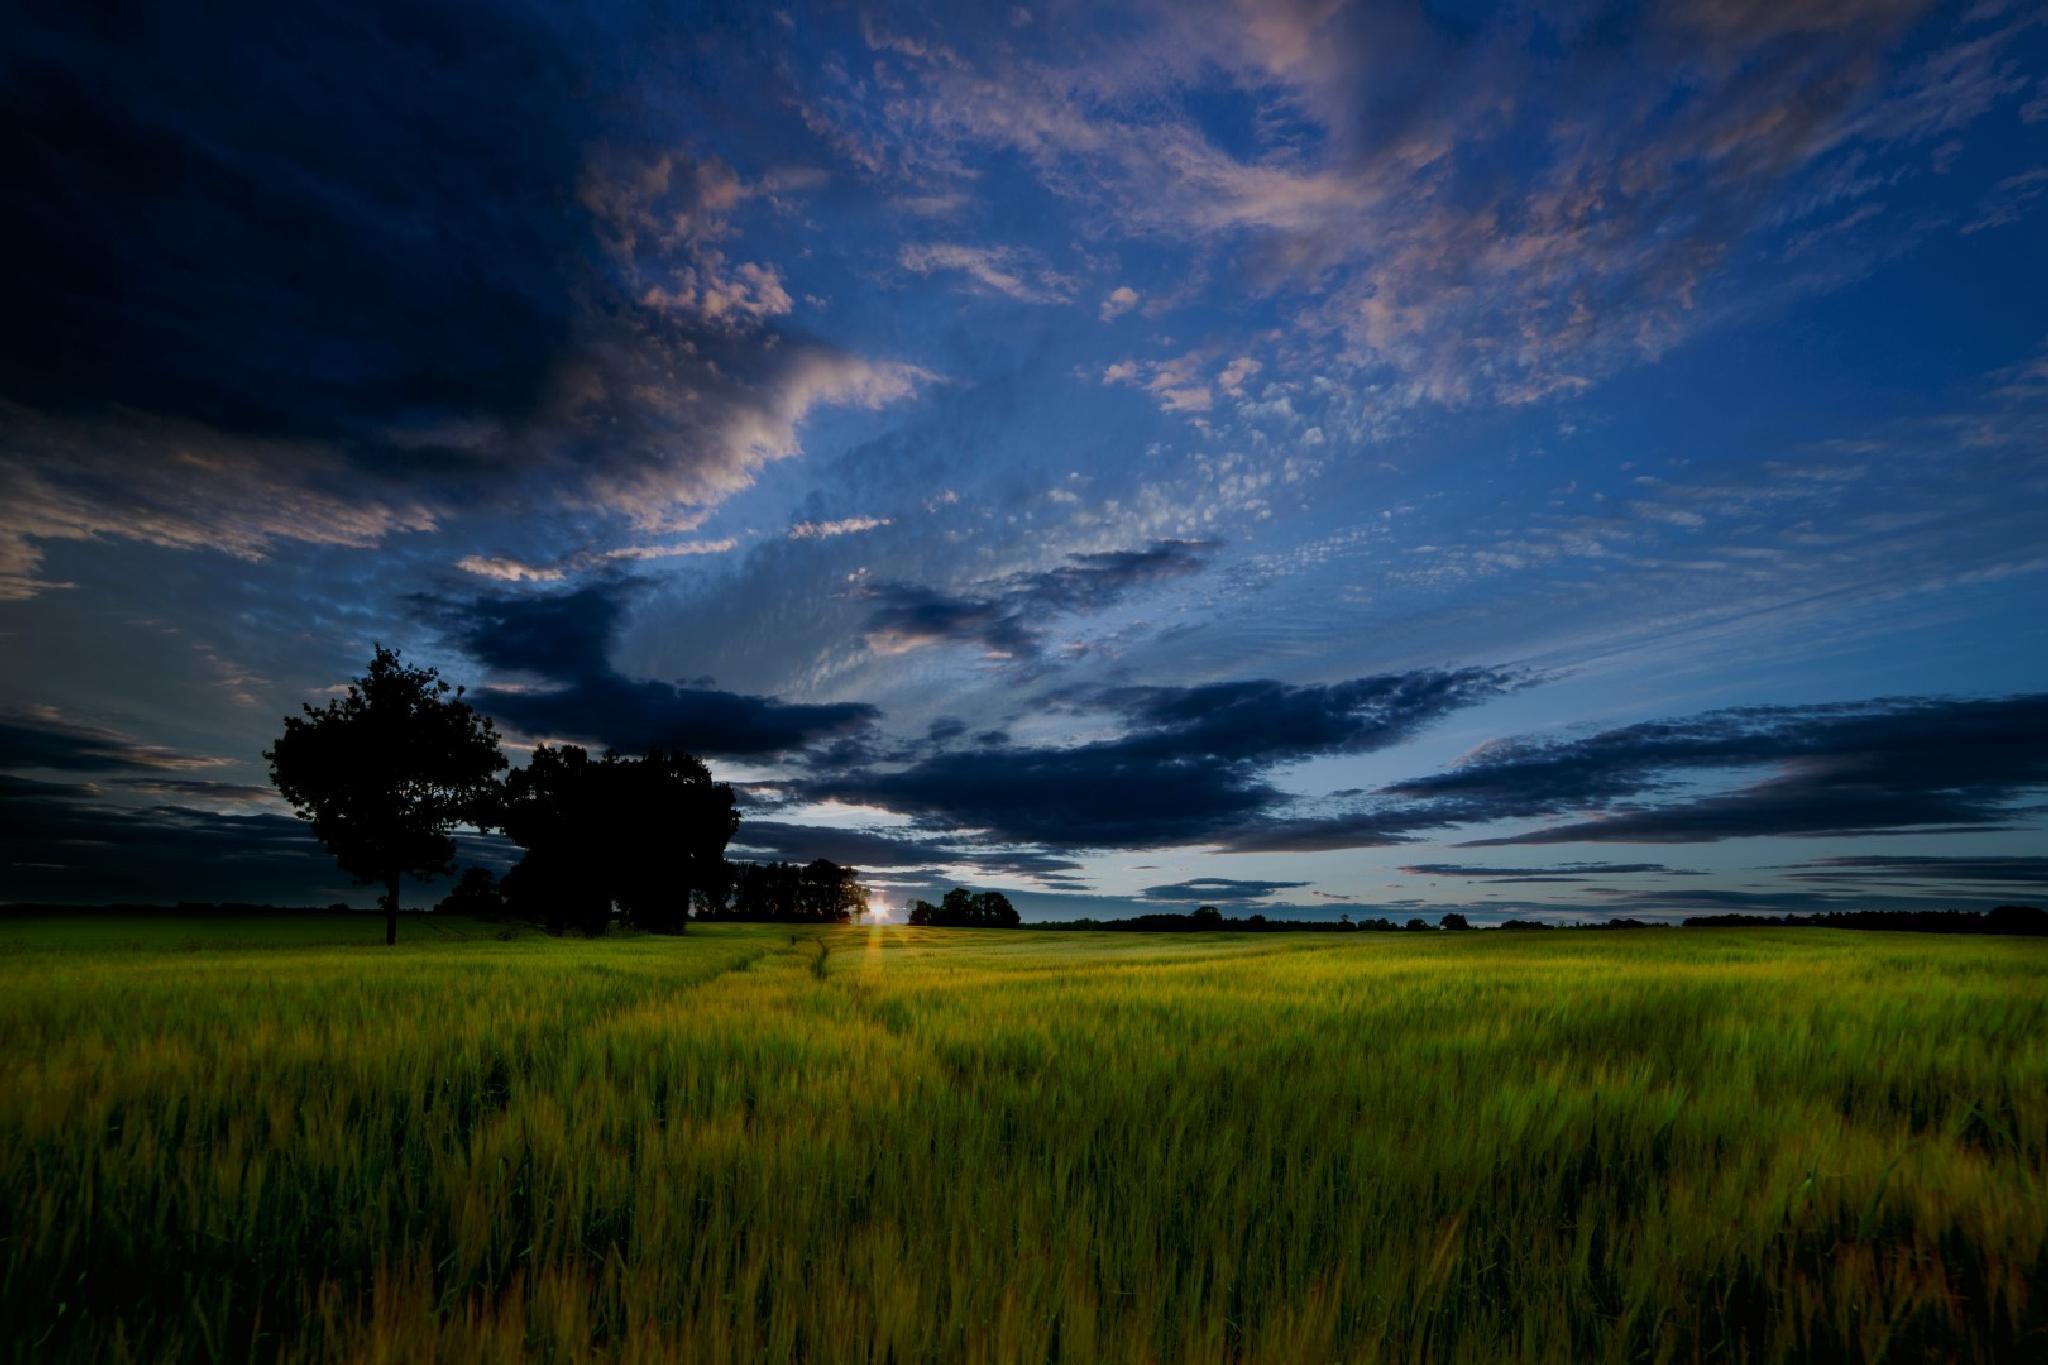 Sunset over Gunton Park by DuncanArnold